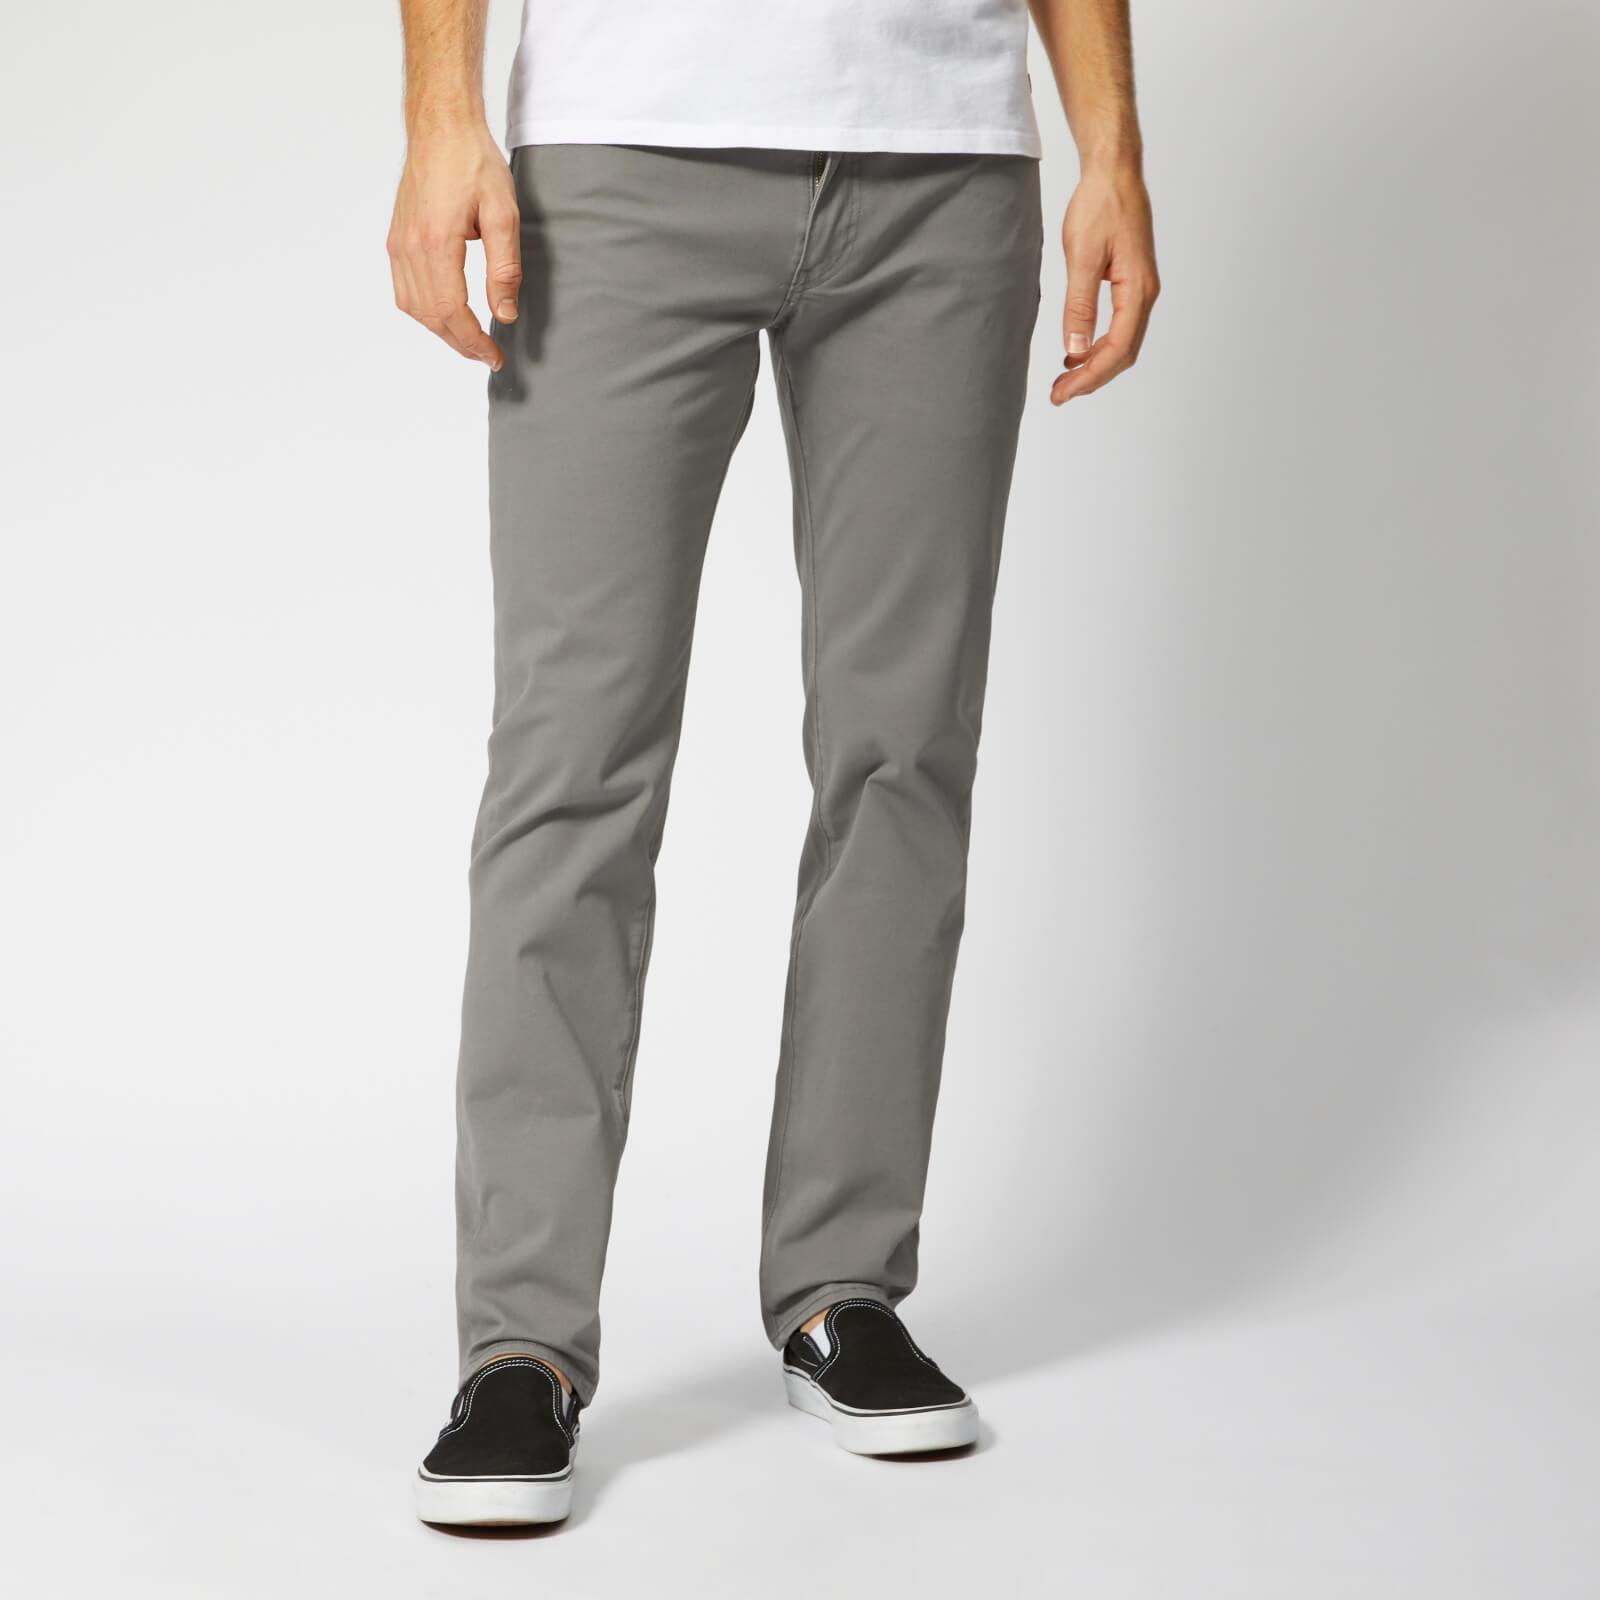 1c3ab34d4a5 Levi's Men's 511 Slim Fit Jeans - Steel Grey Mens Clothing | TheHut.com